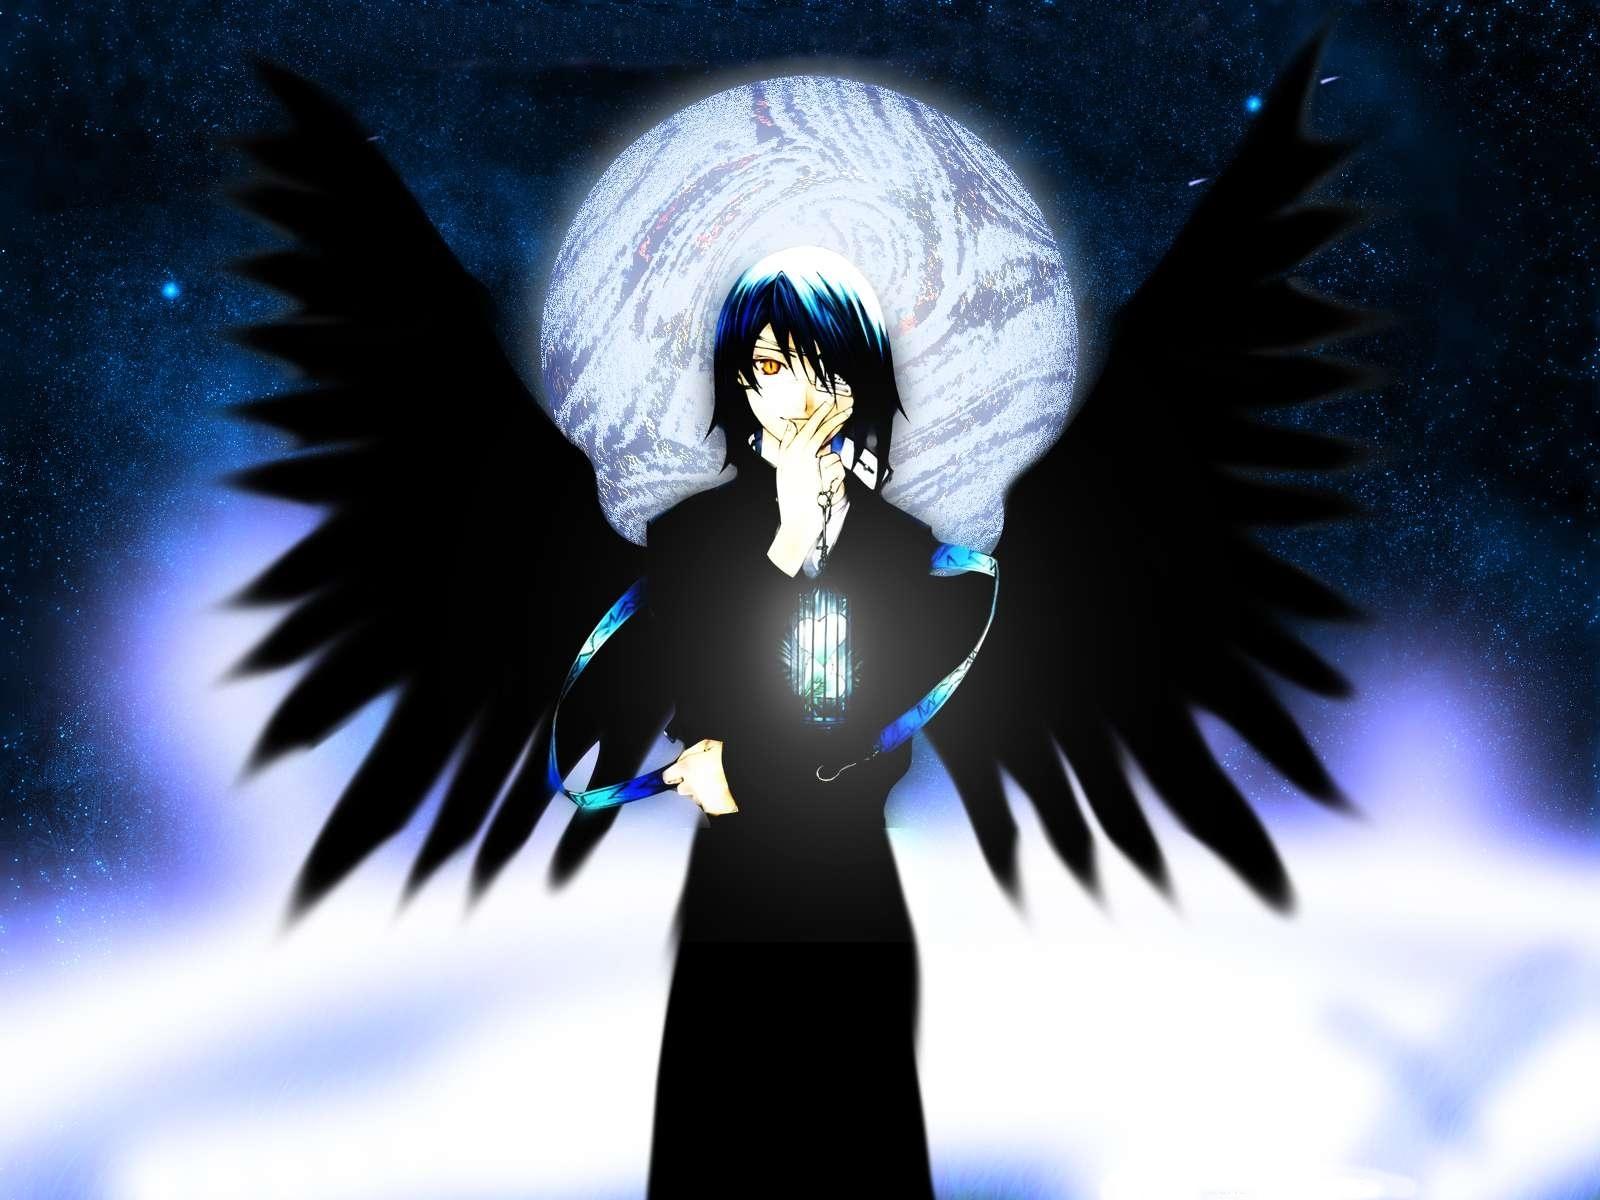 Wallpaper Illustration Anime Brunette Wings Angel Moon Boy